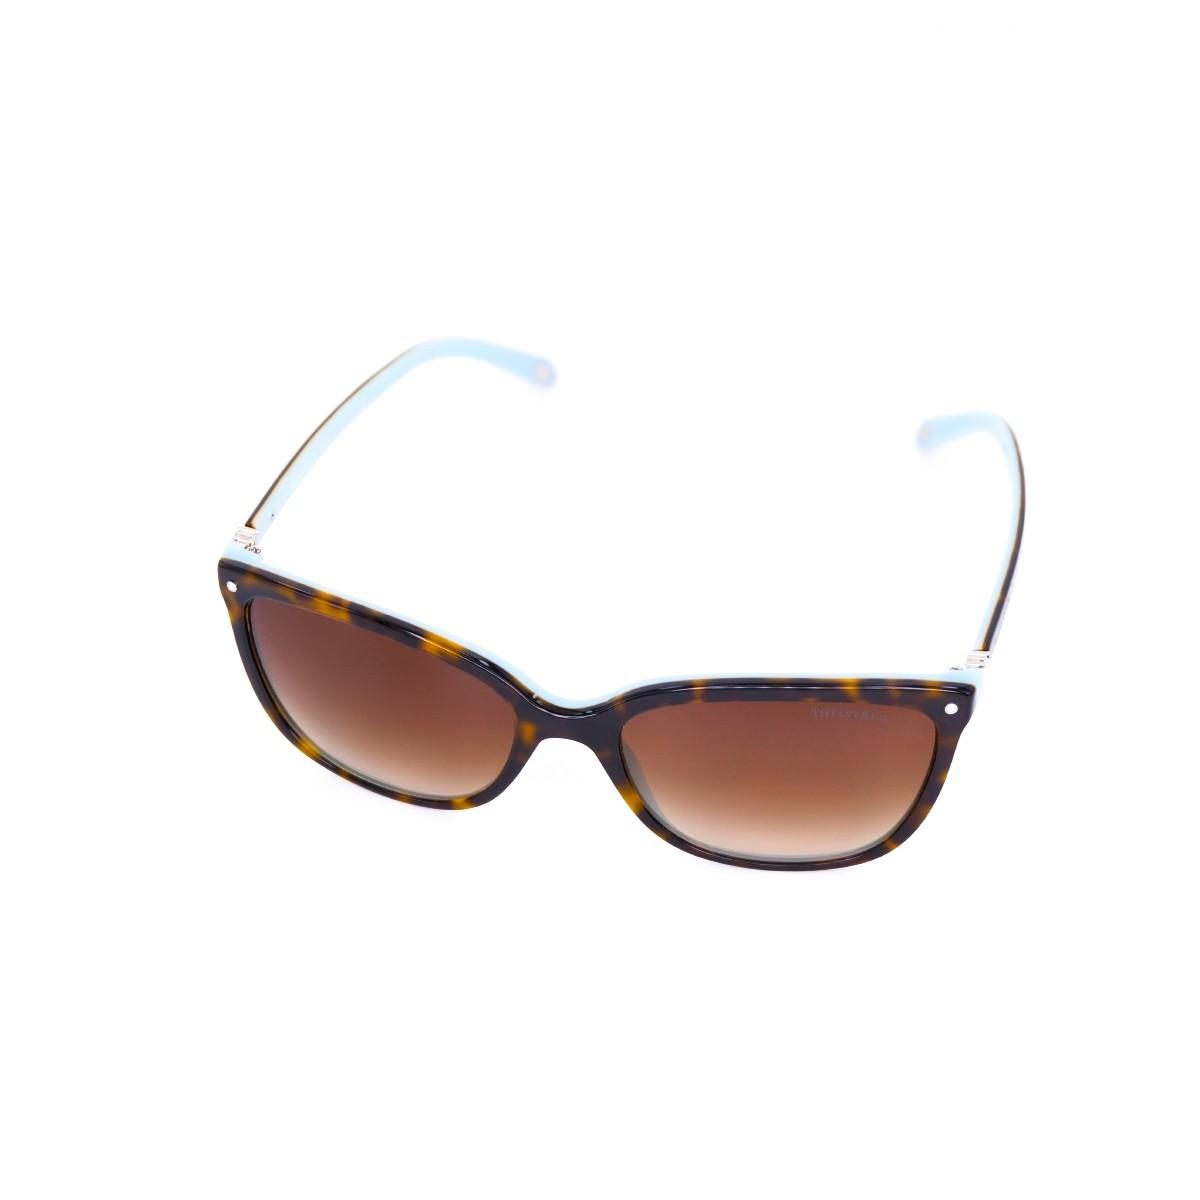 Tiffany 4105 81343B, 181,00€, Occhiali Tiffany & Co. Marrone a forma Rettangolare